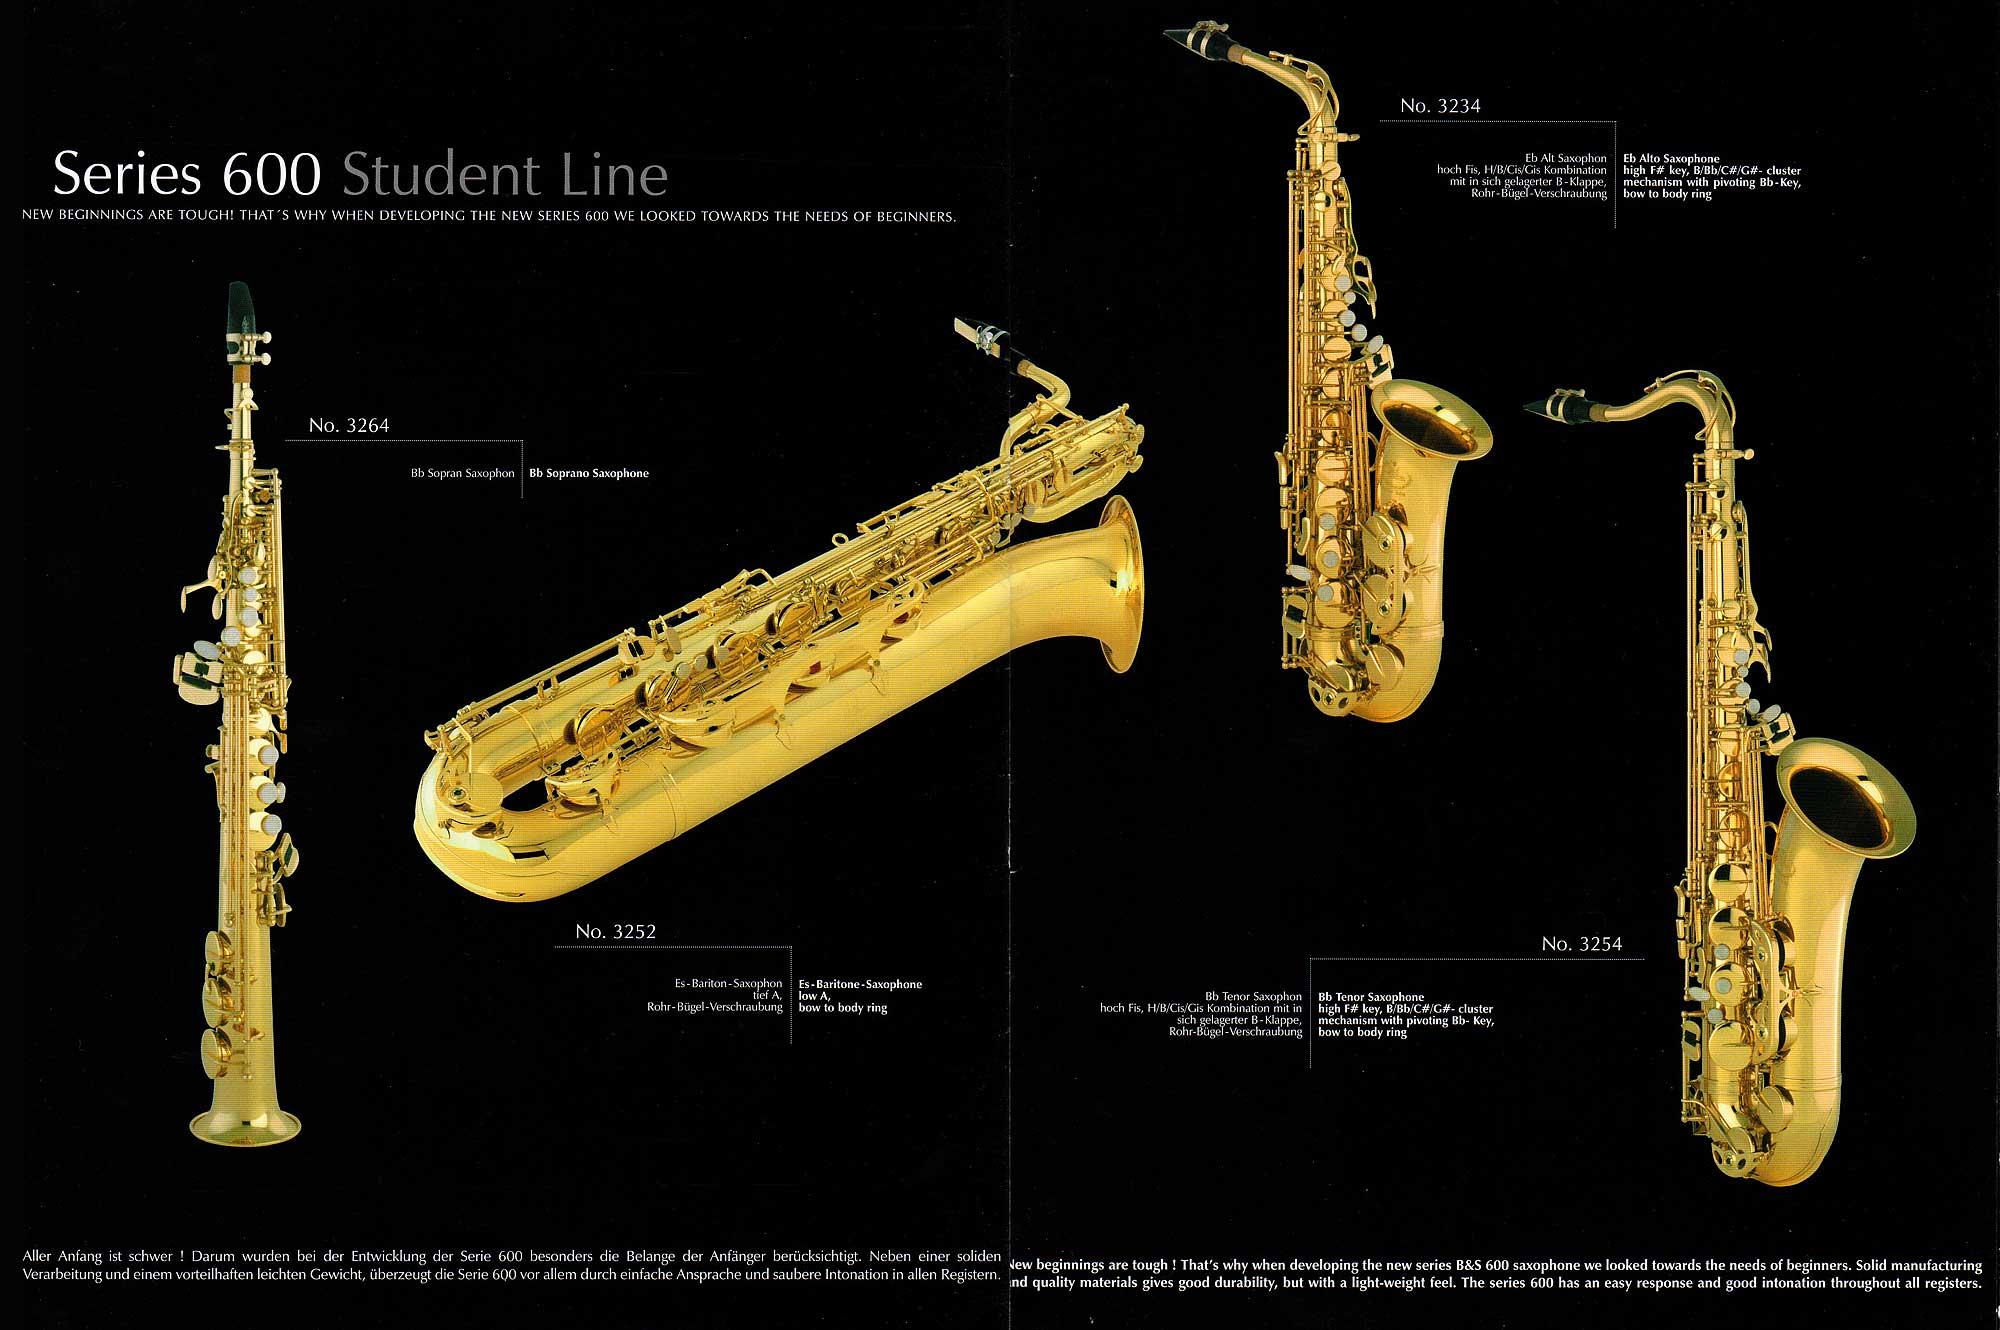 B&S saxophone, dealer prospectus, brochure, saxophone brochure Series 600 B&S saxophones, VMI